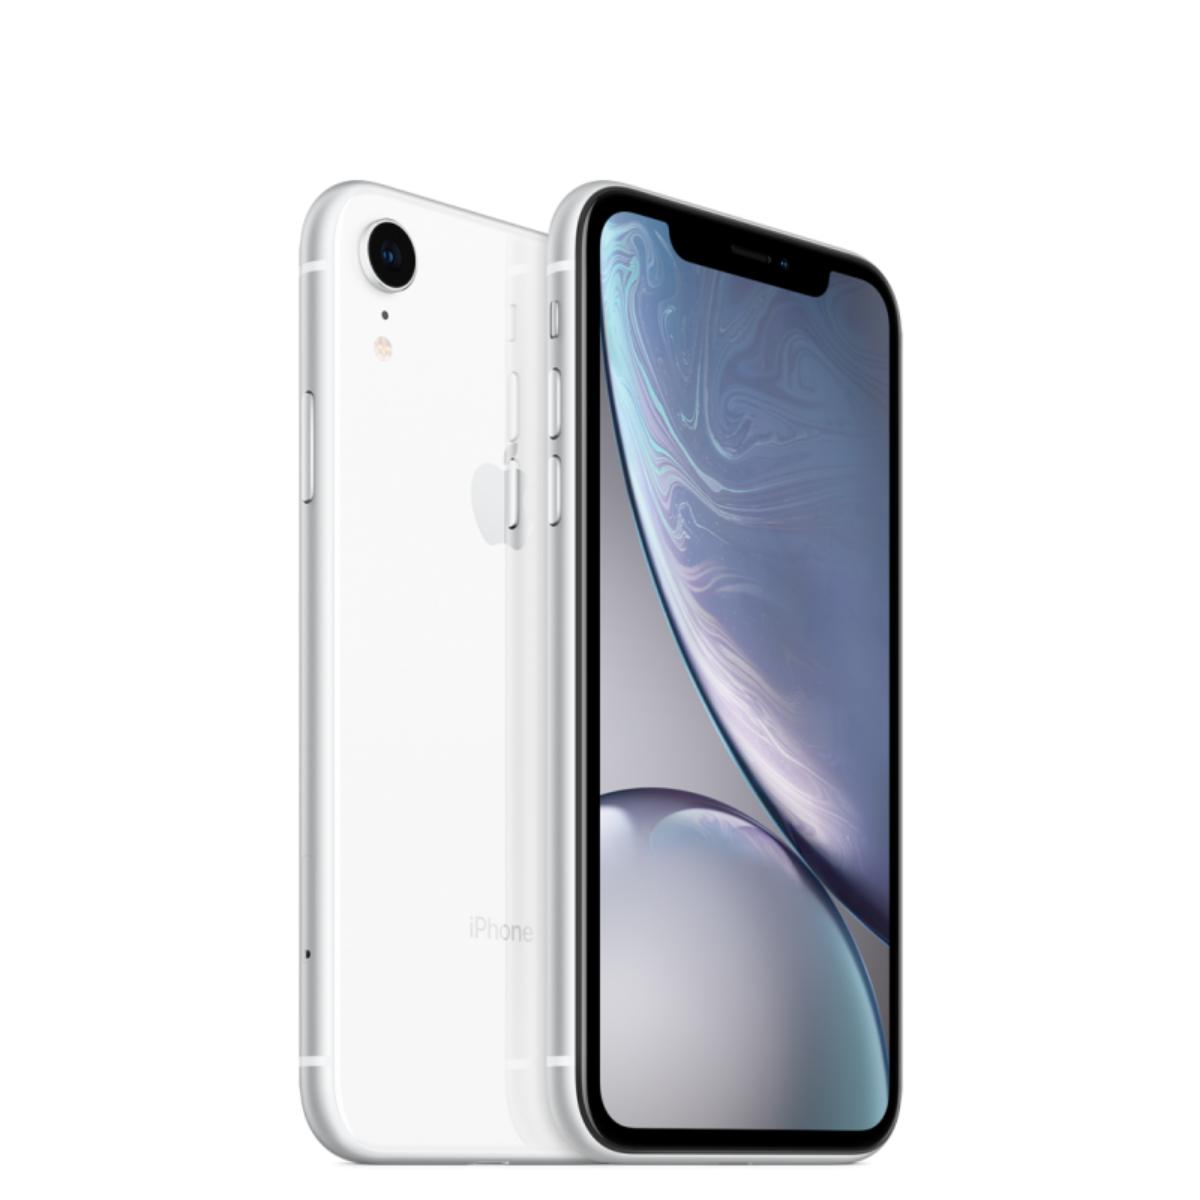 Sim Free Apple iPhone XR 64GB Unlocked Mobile Phone - White